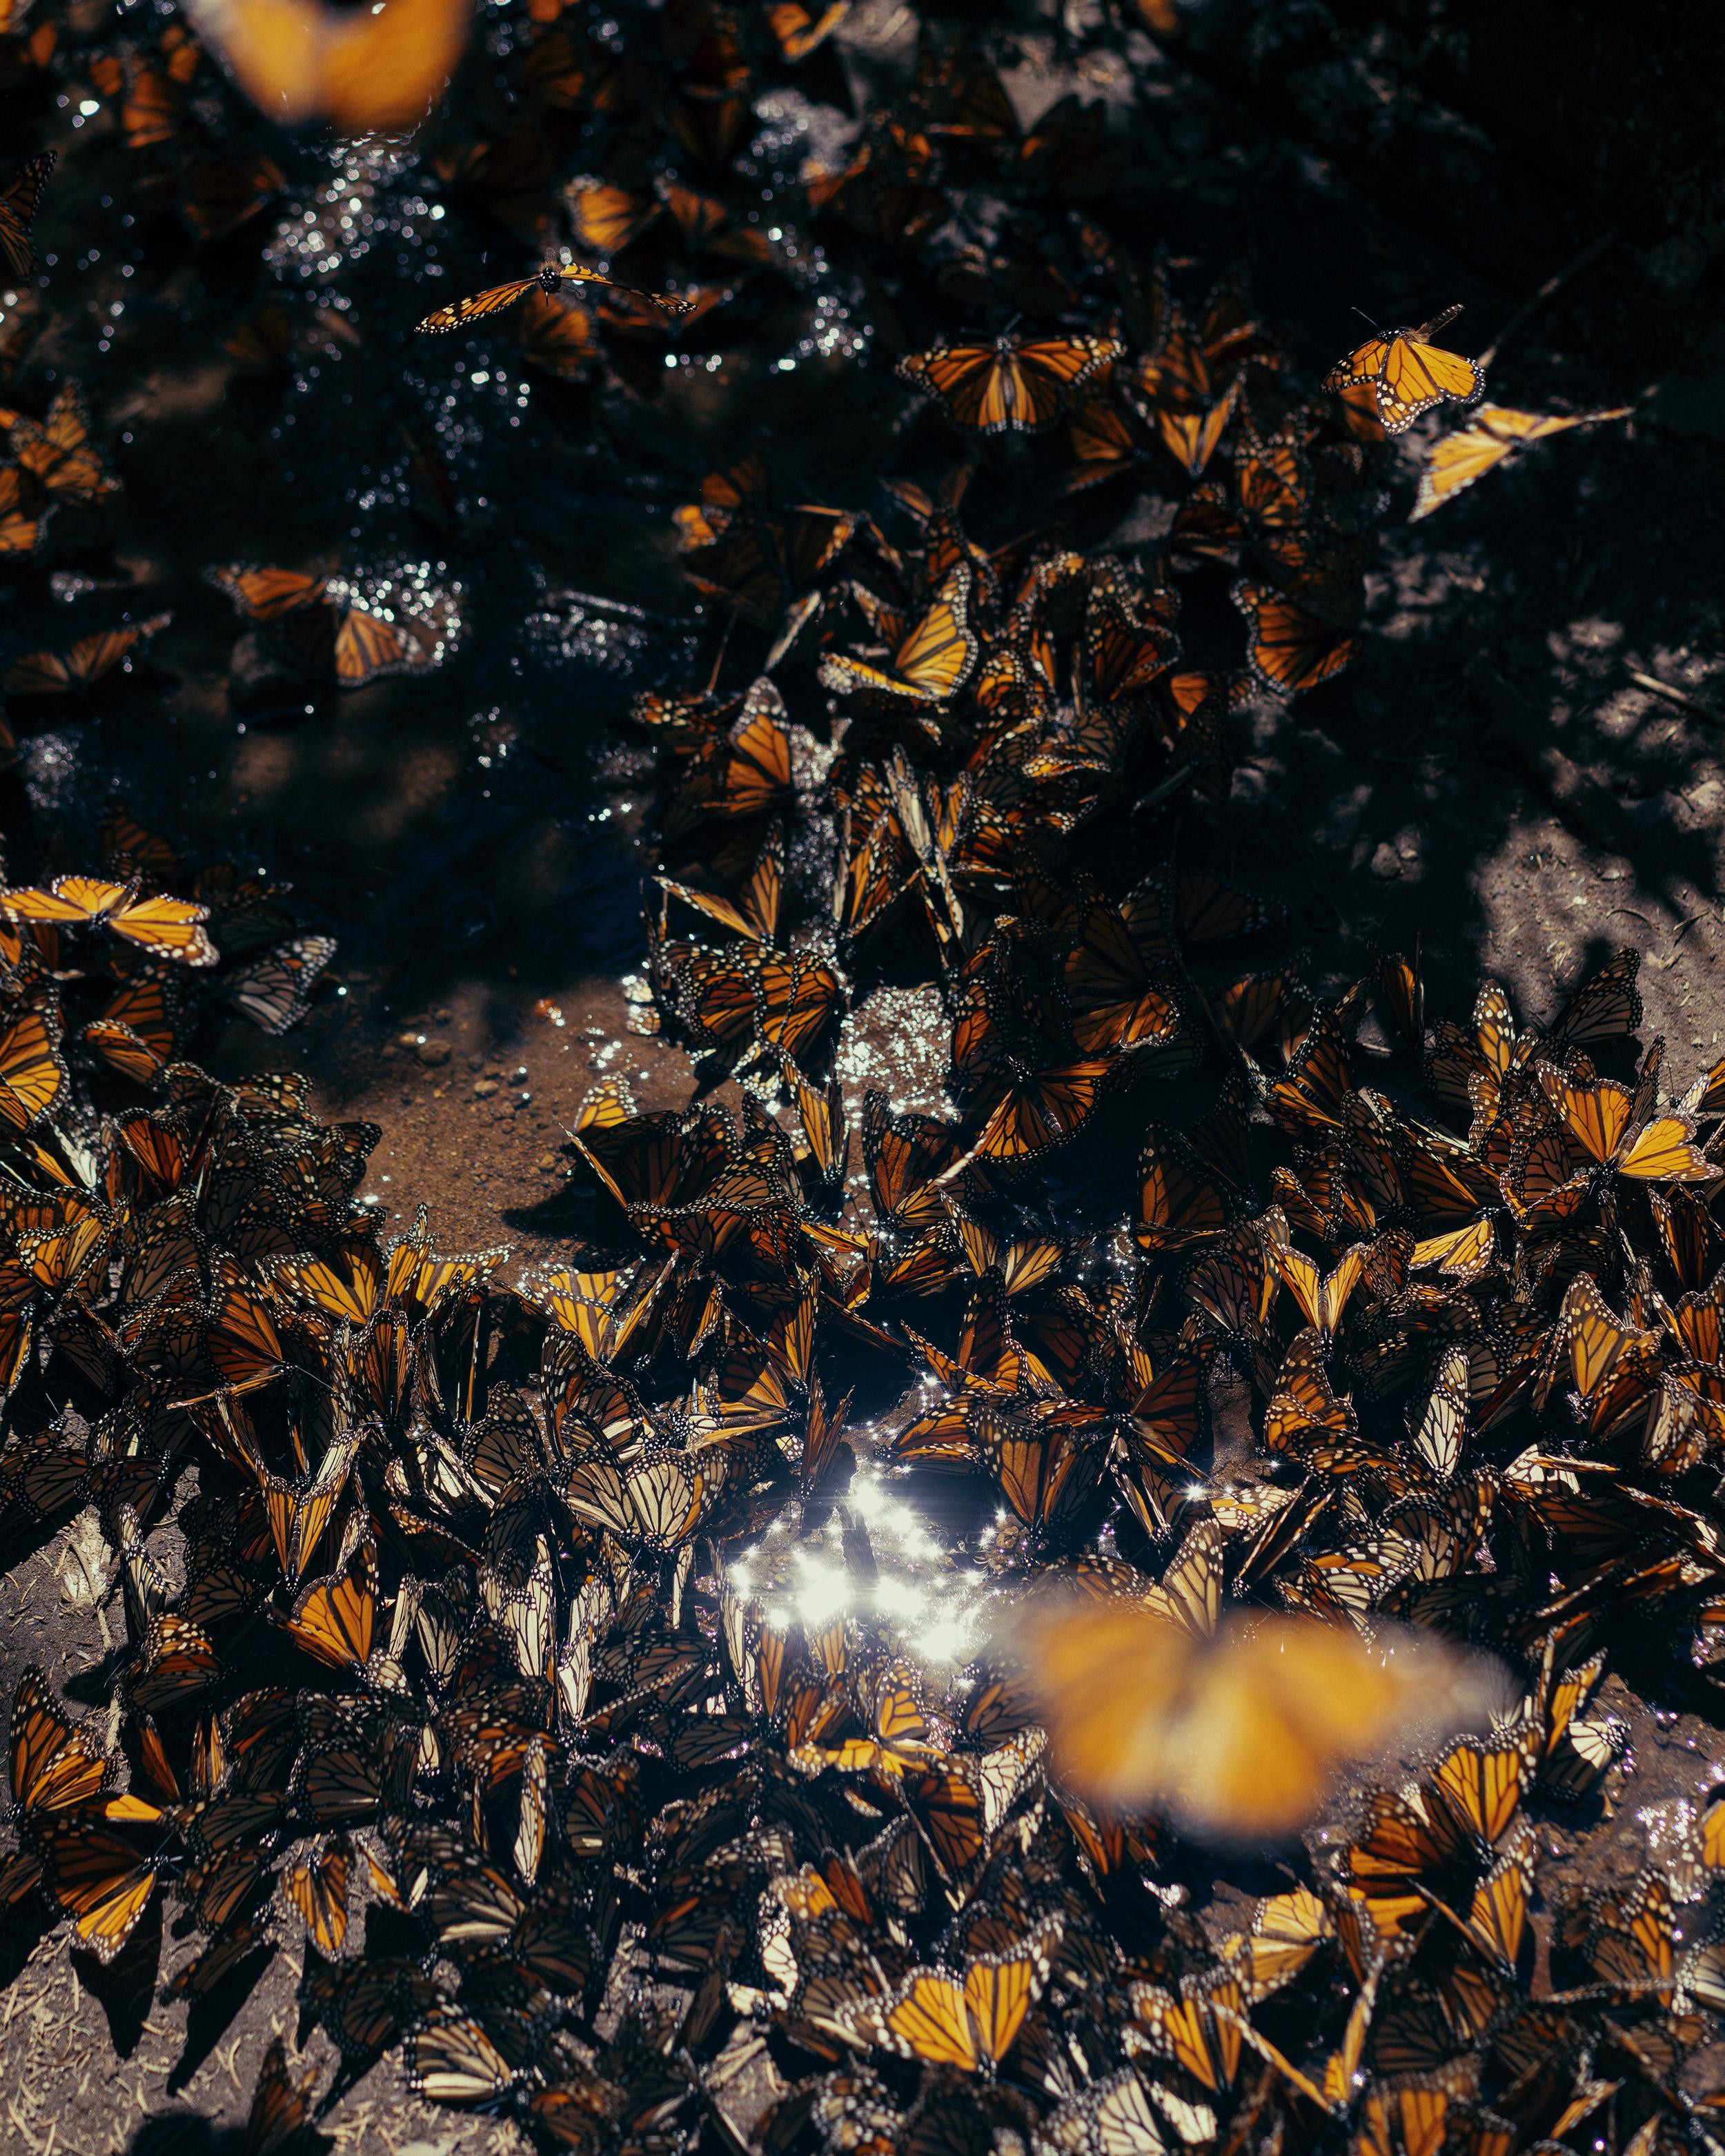 A cluster of Monarch butterflies